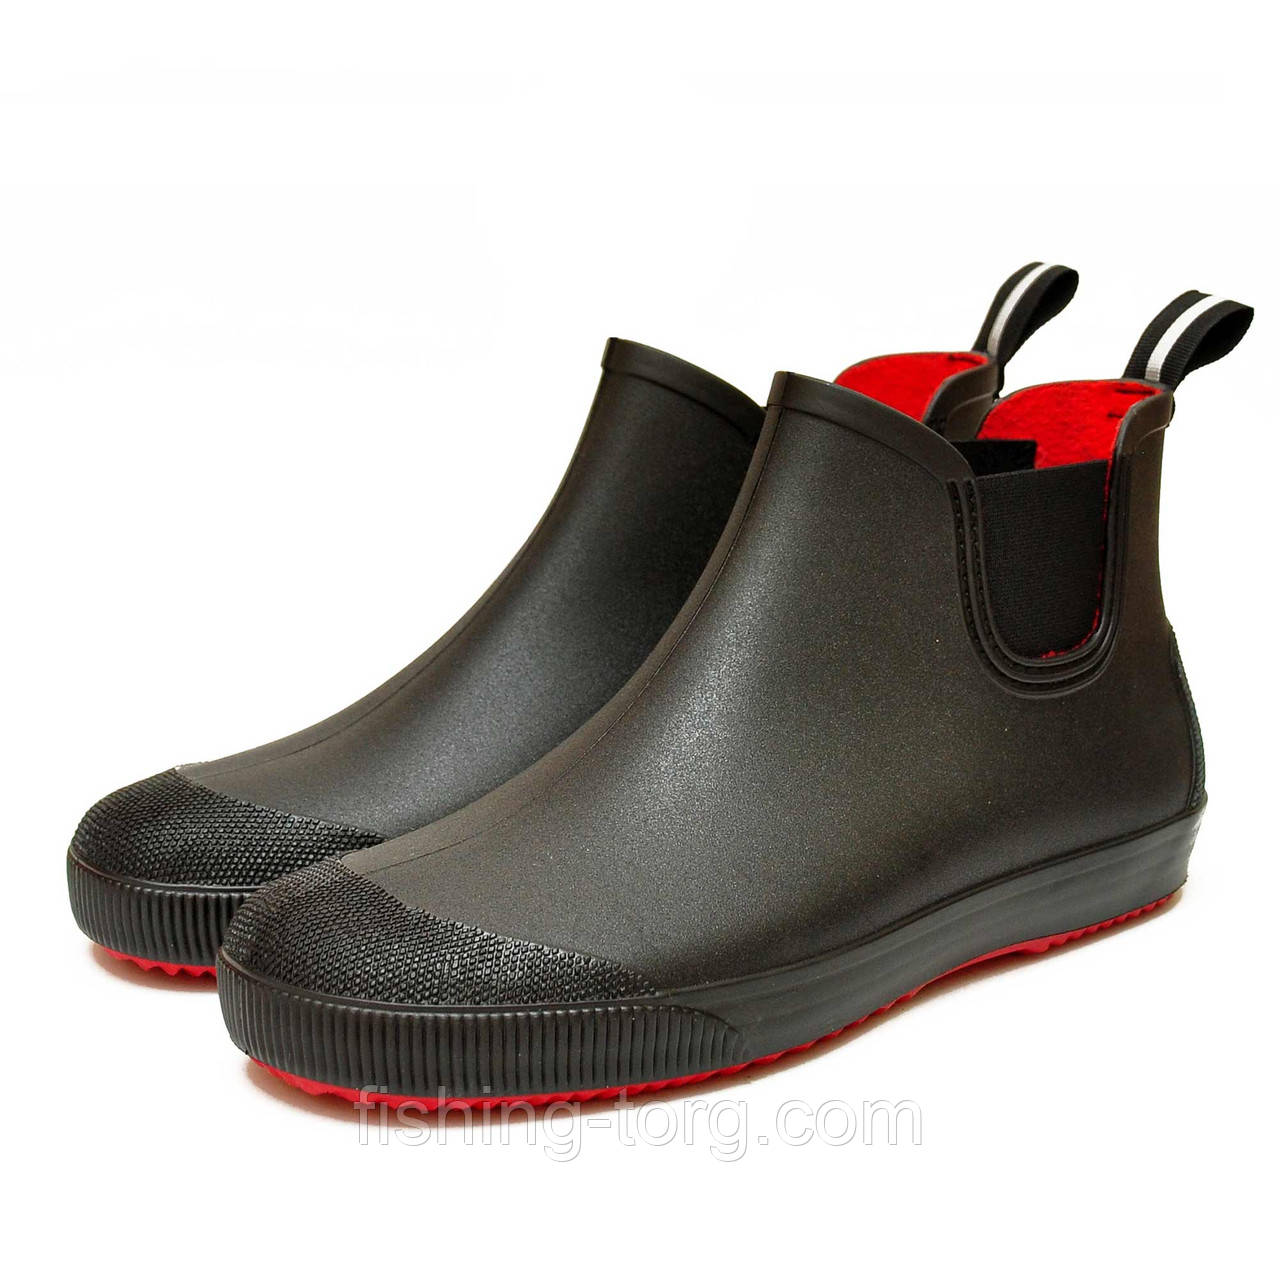 Ботинки мужские Nordman Beat ПC-30 размер 46